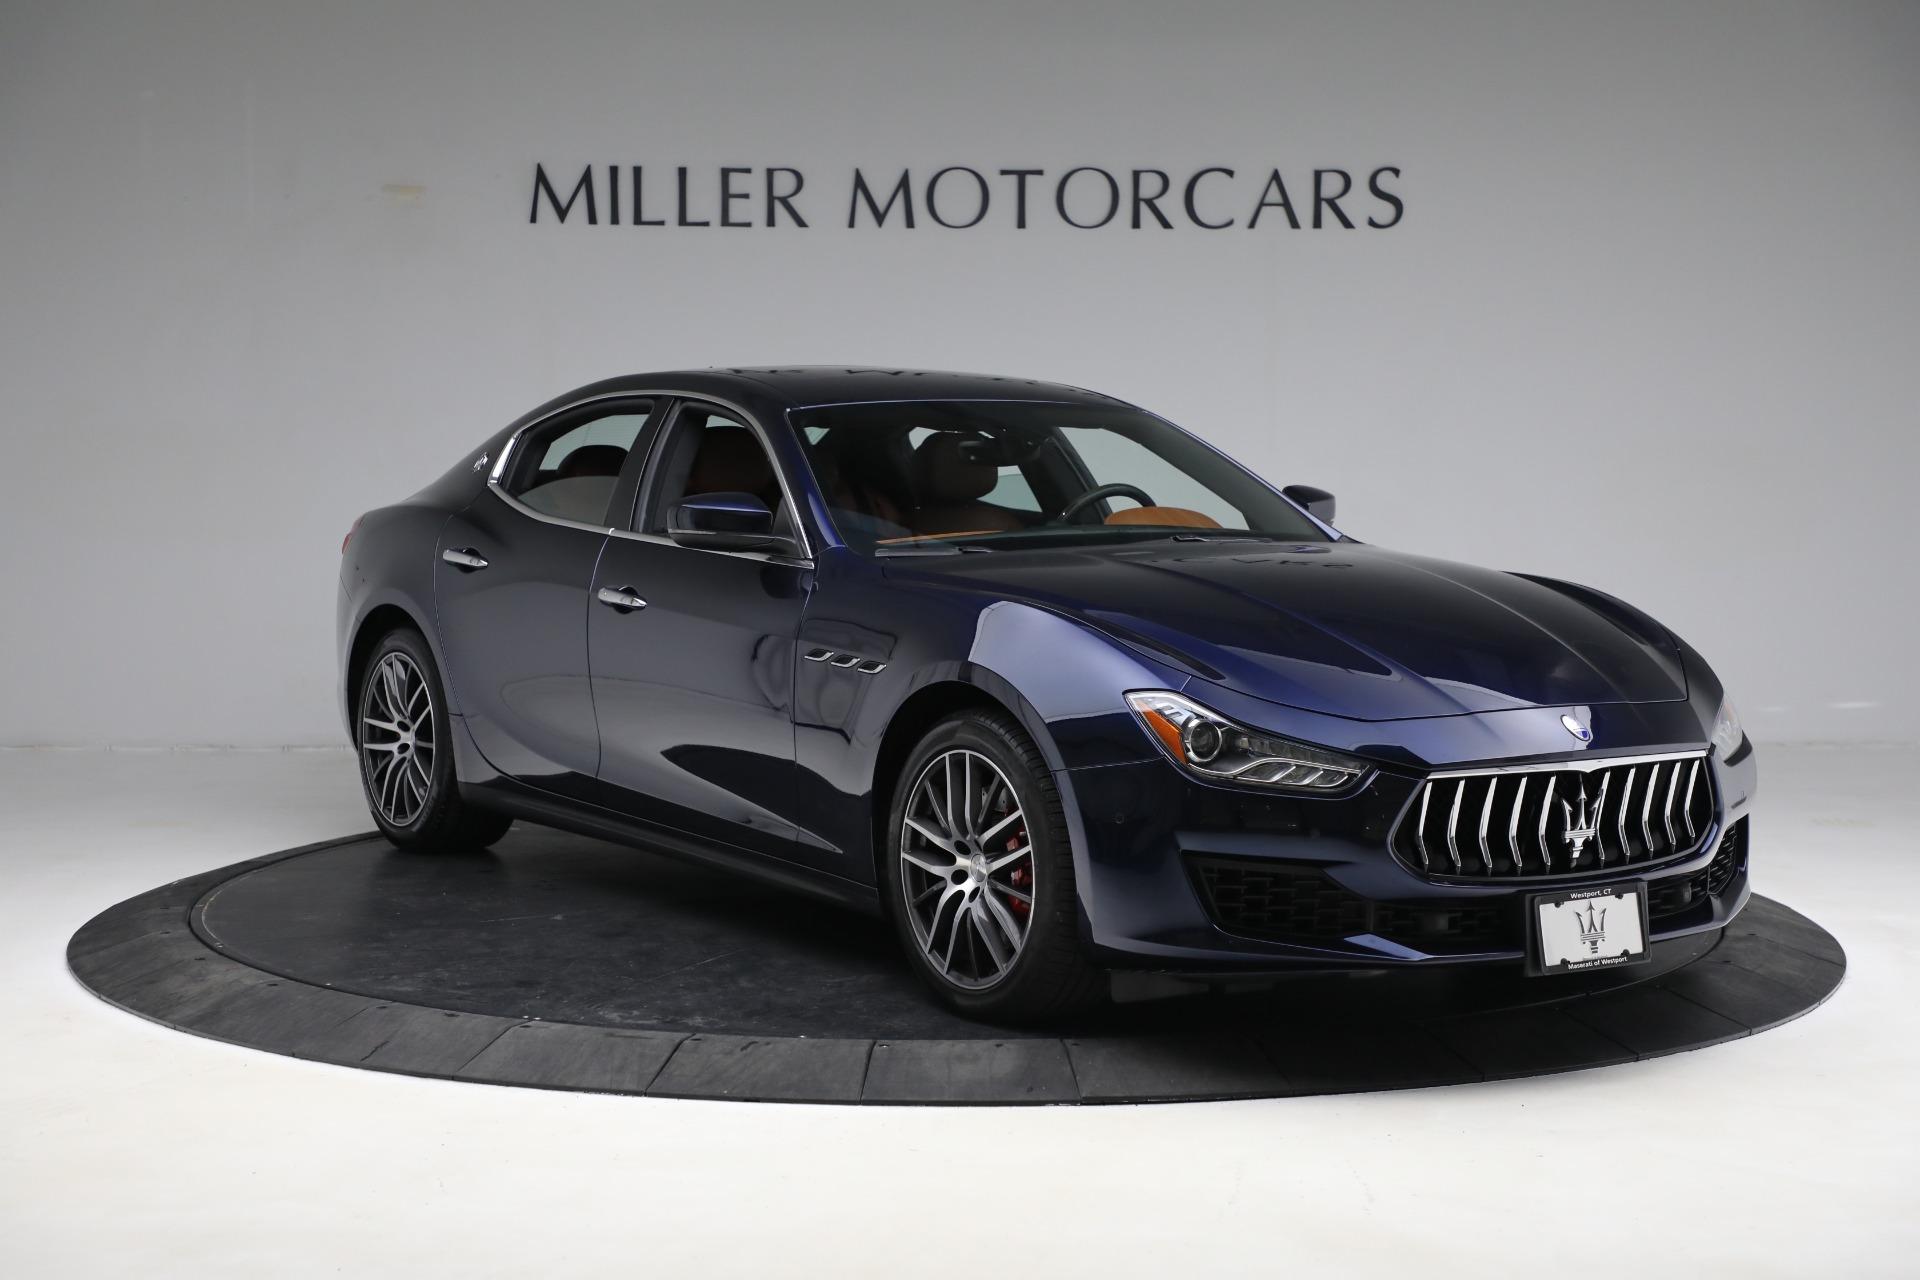 New 2019 Maserati Ghibli S Q4 For Sale In Westport, CT 3020_p11